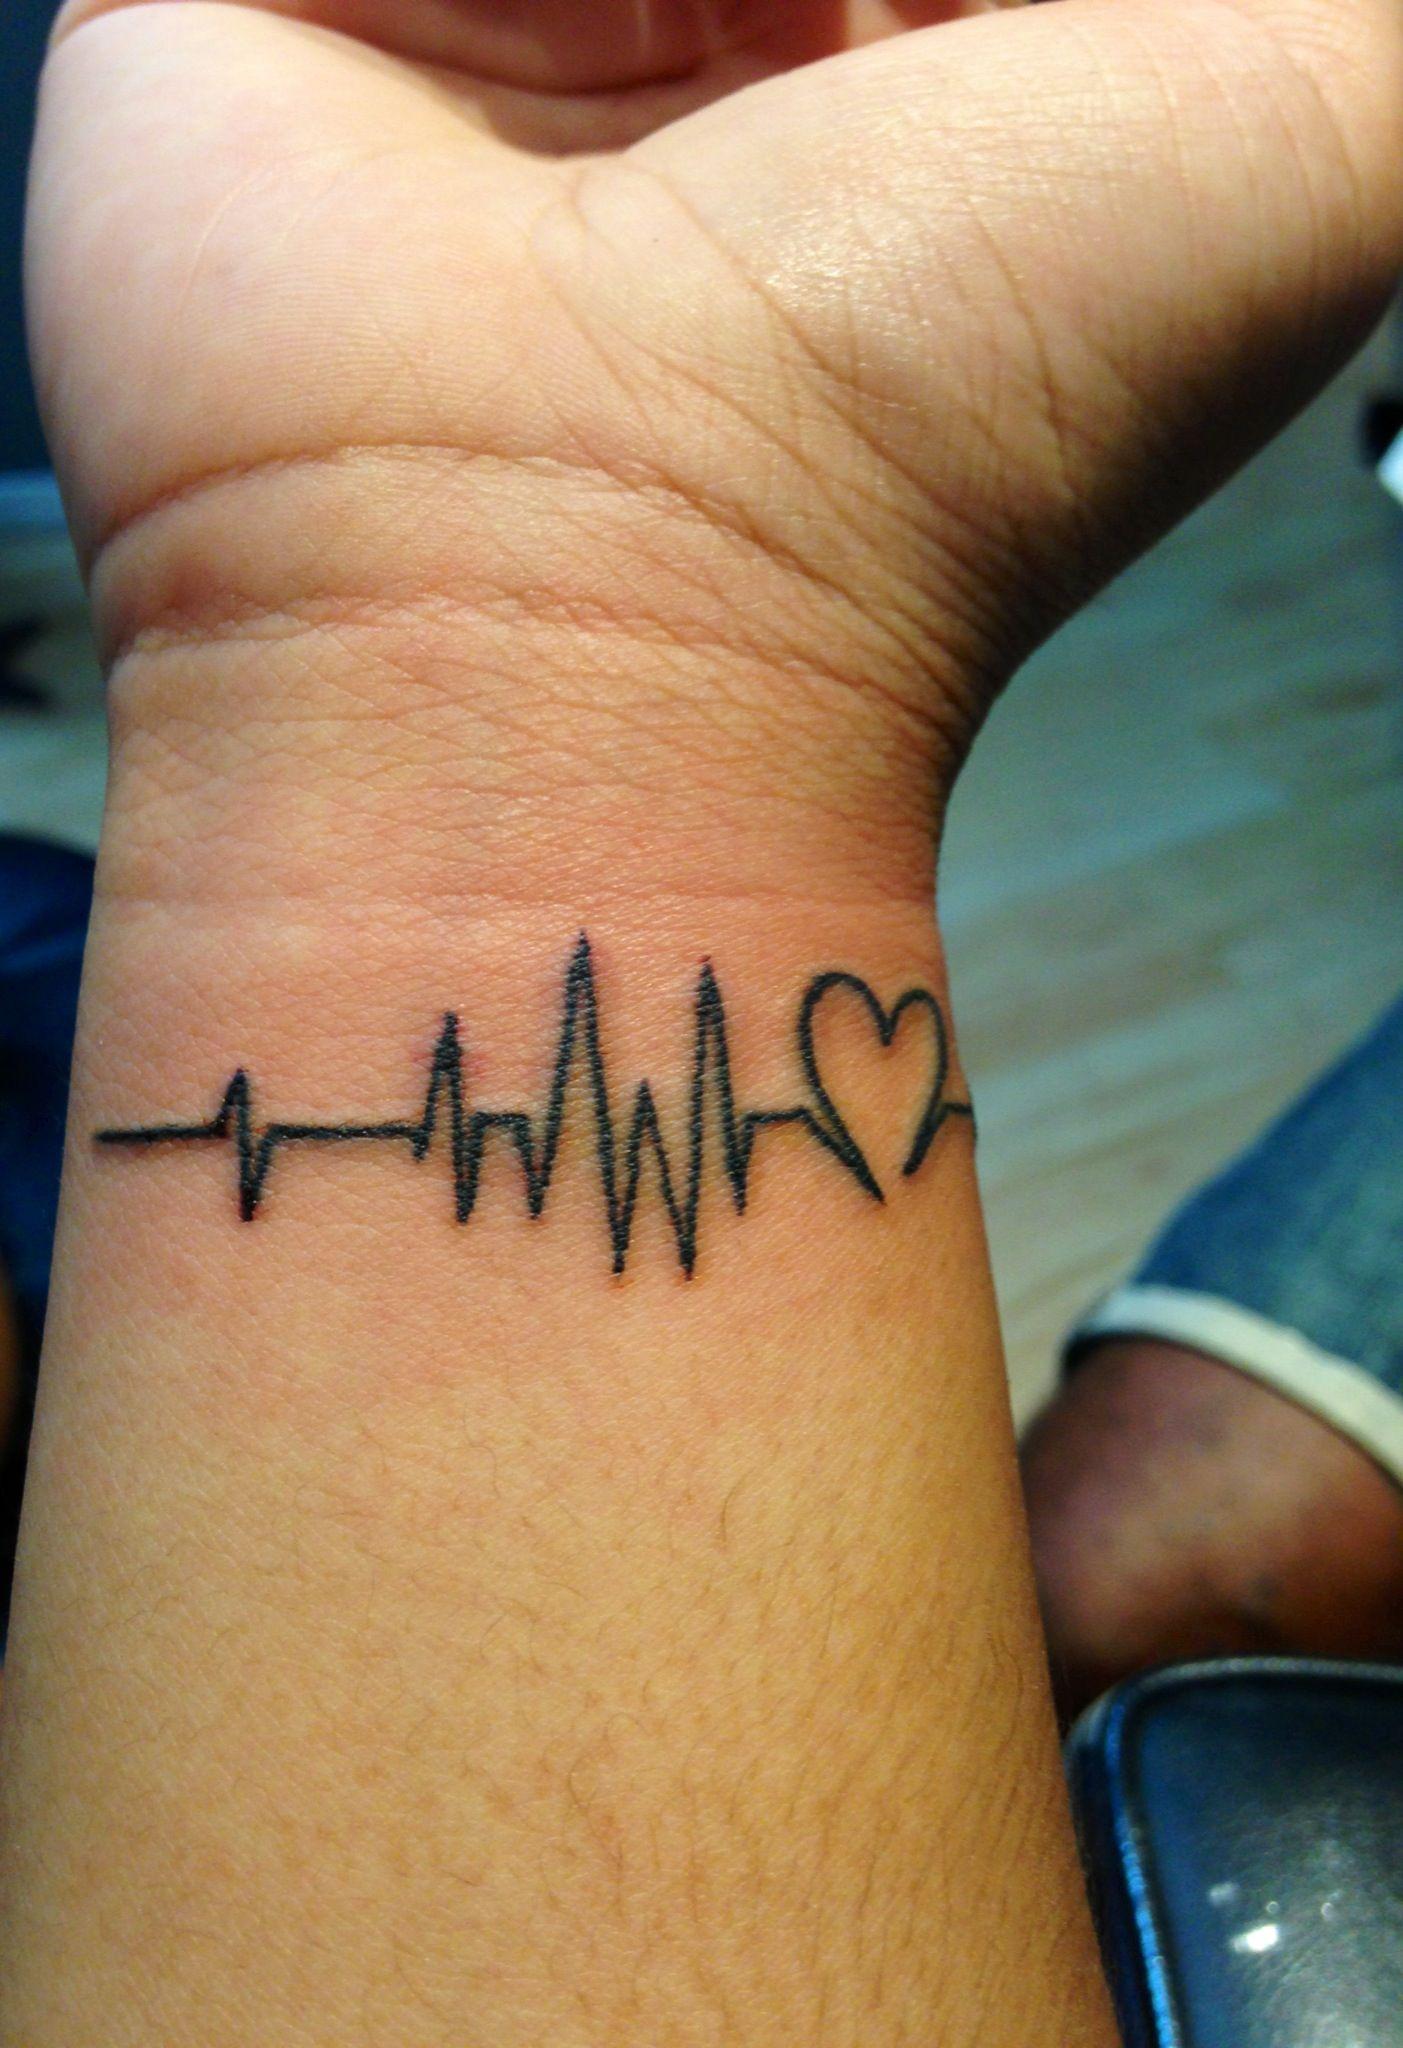 Pin By Julio Izquierdo Benito On Tattoos Piercings Ankle Tattoo Kid Name Tattoo Tattoos